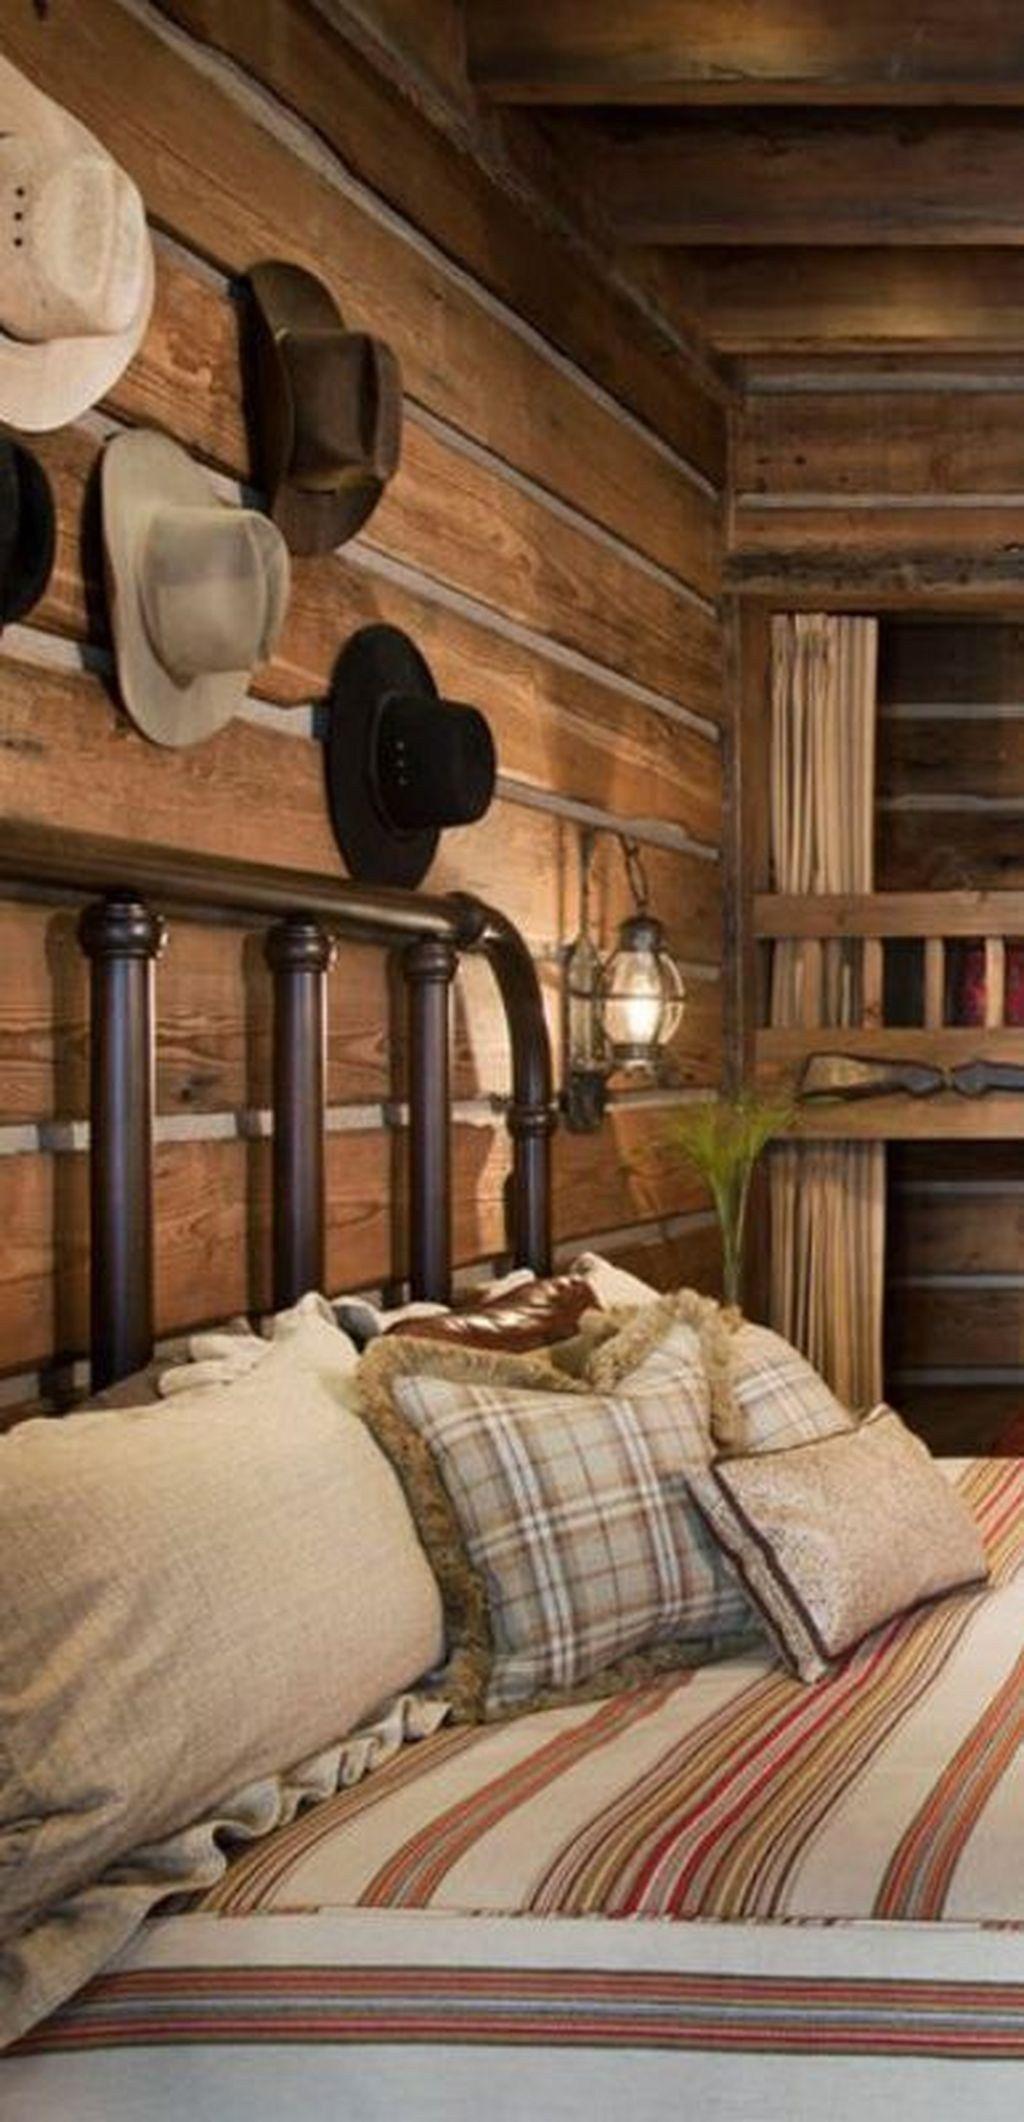 Classic and vintage farmhouse bedroom ideas 12   Decoration ...